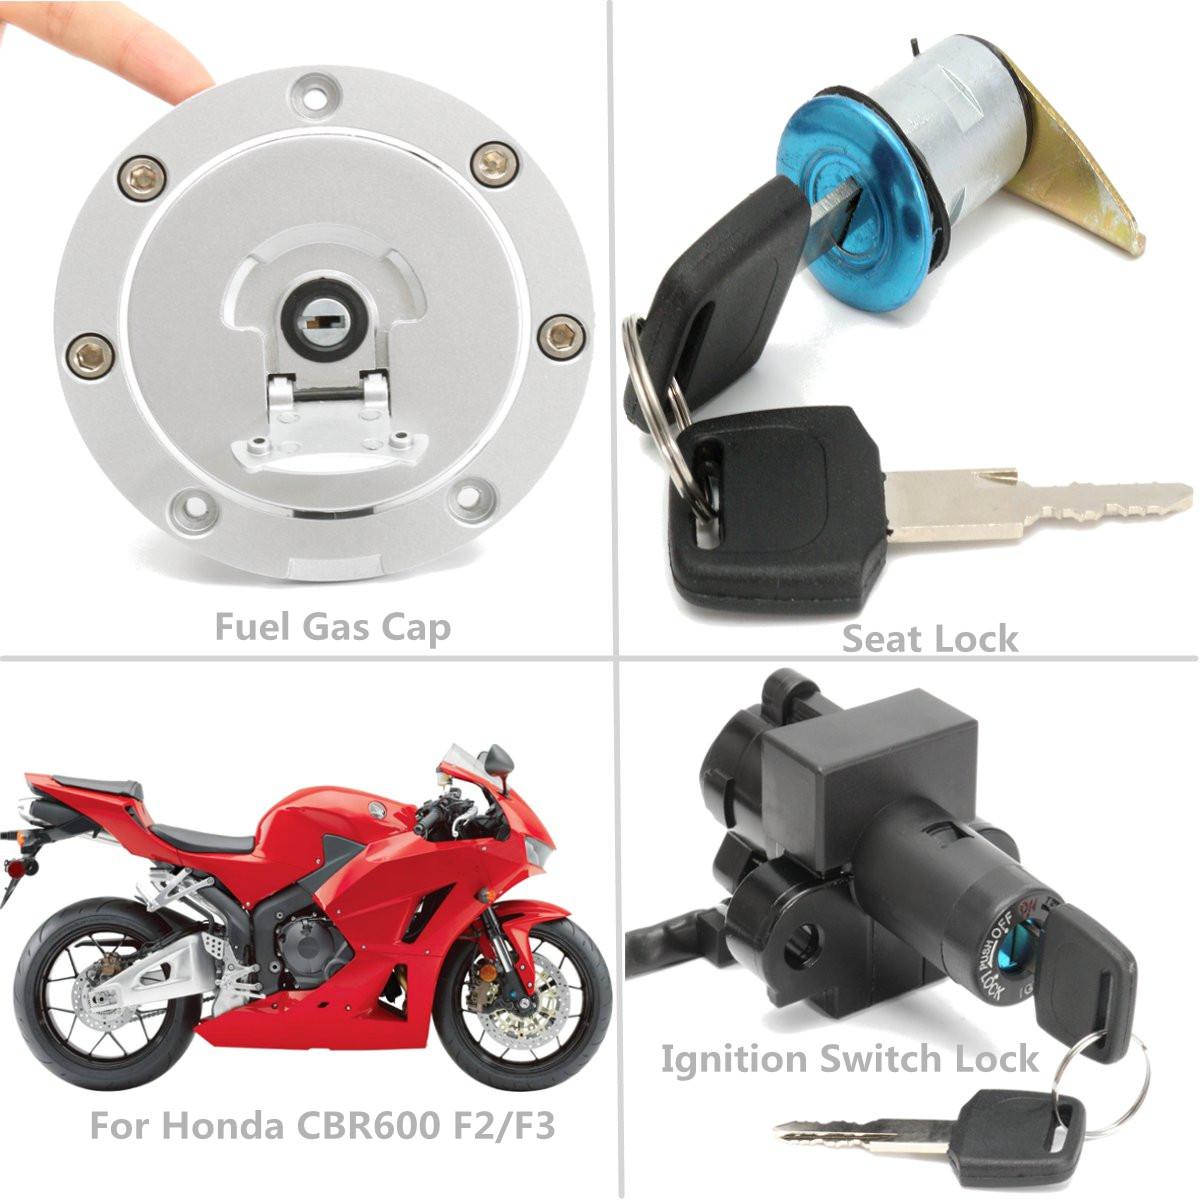 Aluminum Ignition Switch Lock Fuel Gas Cap Key Set For Honda Cbr600